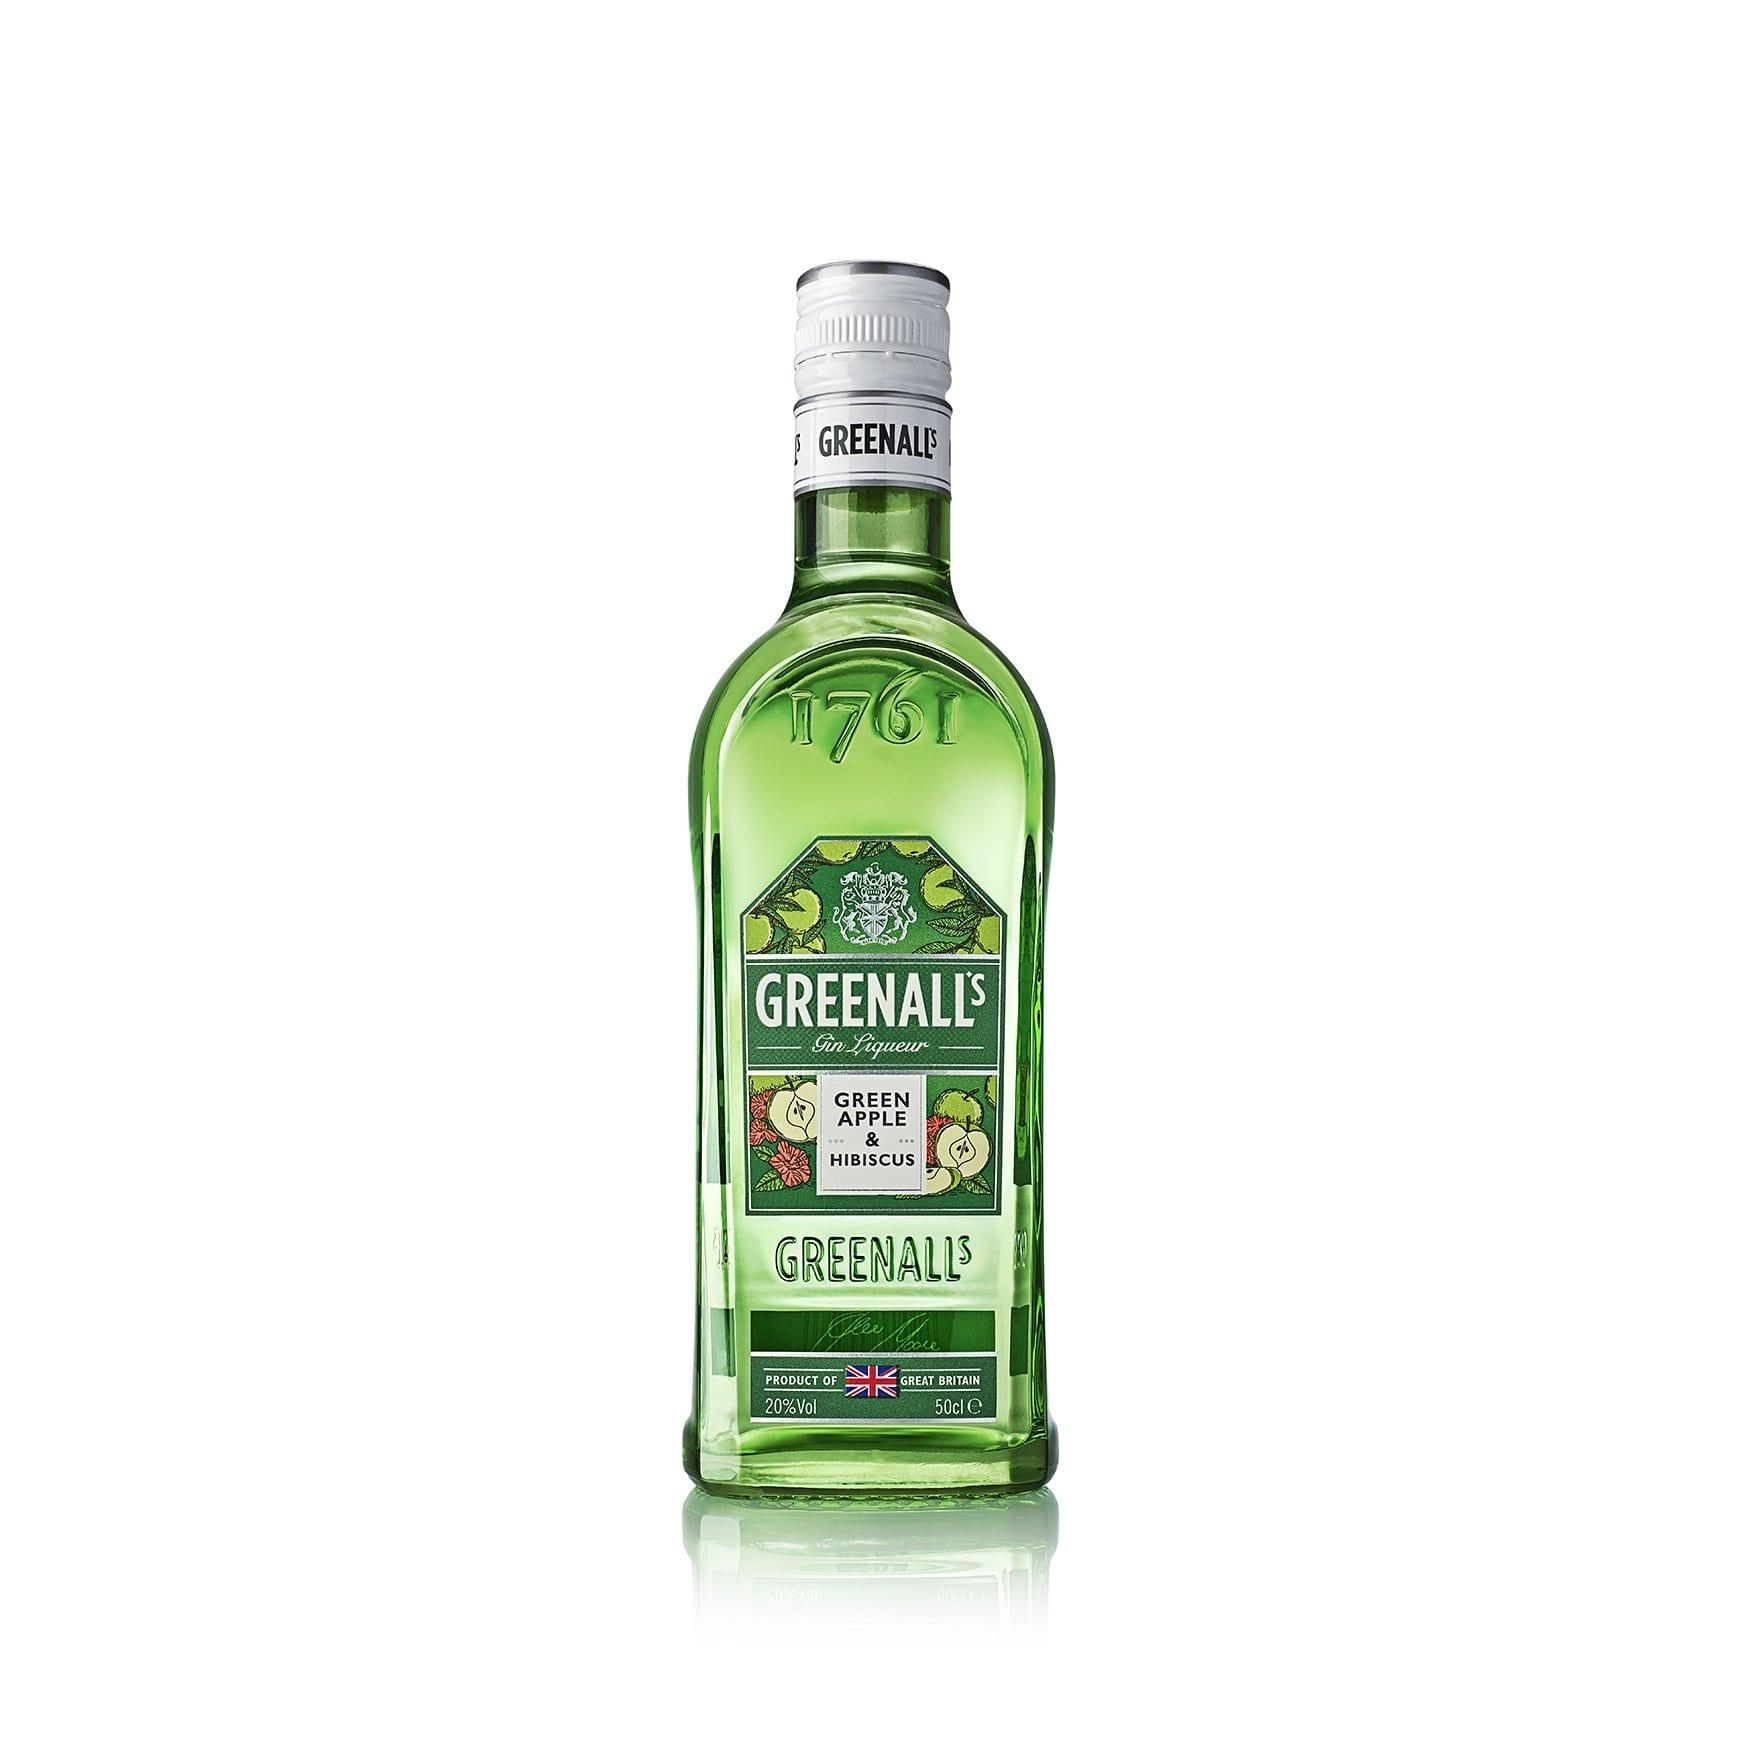 Greenall's Green Apple & Hibiscus Gin Liqueur